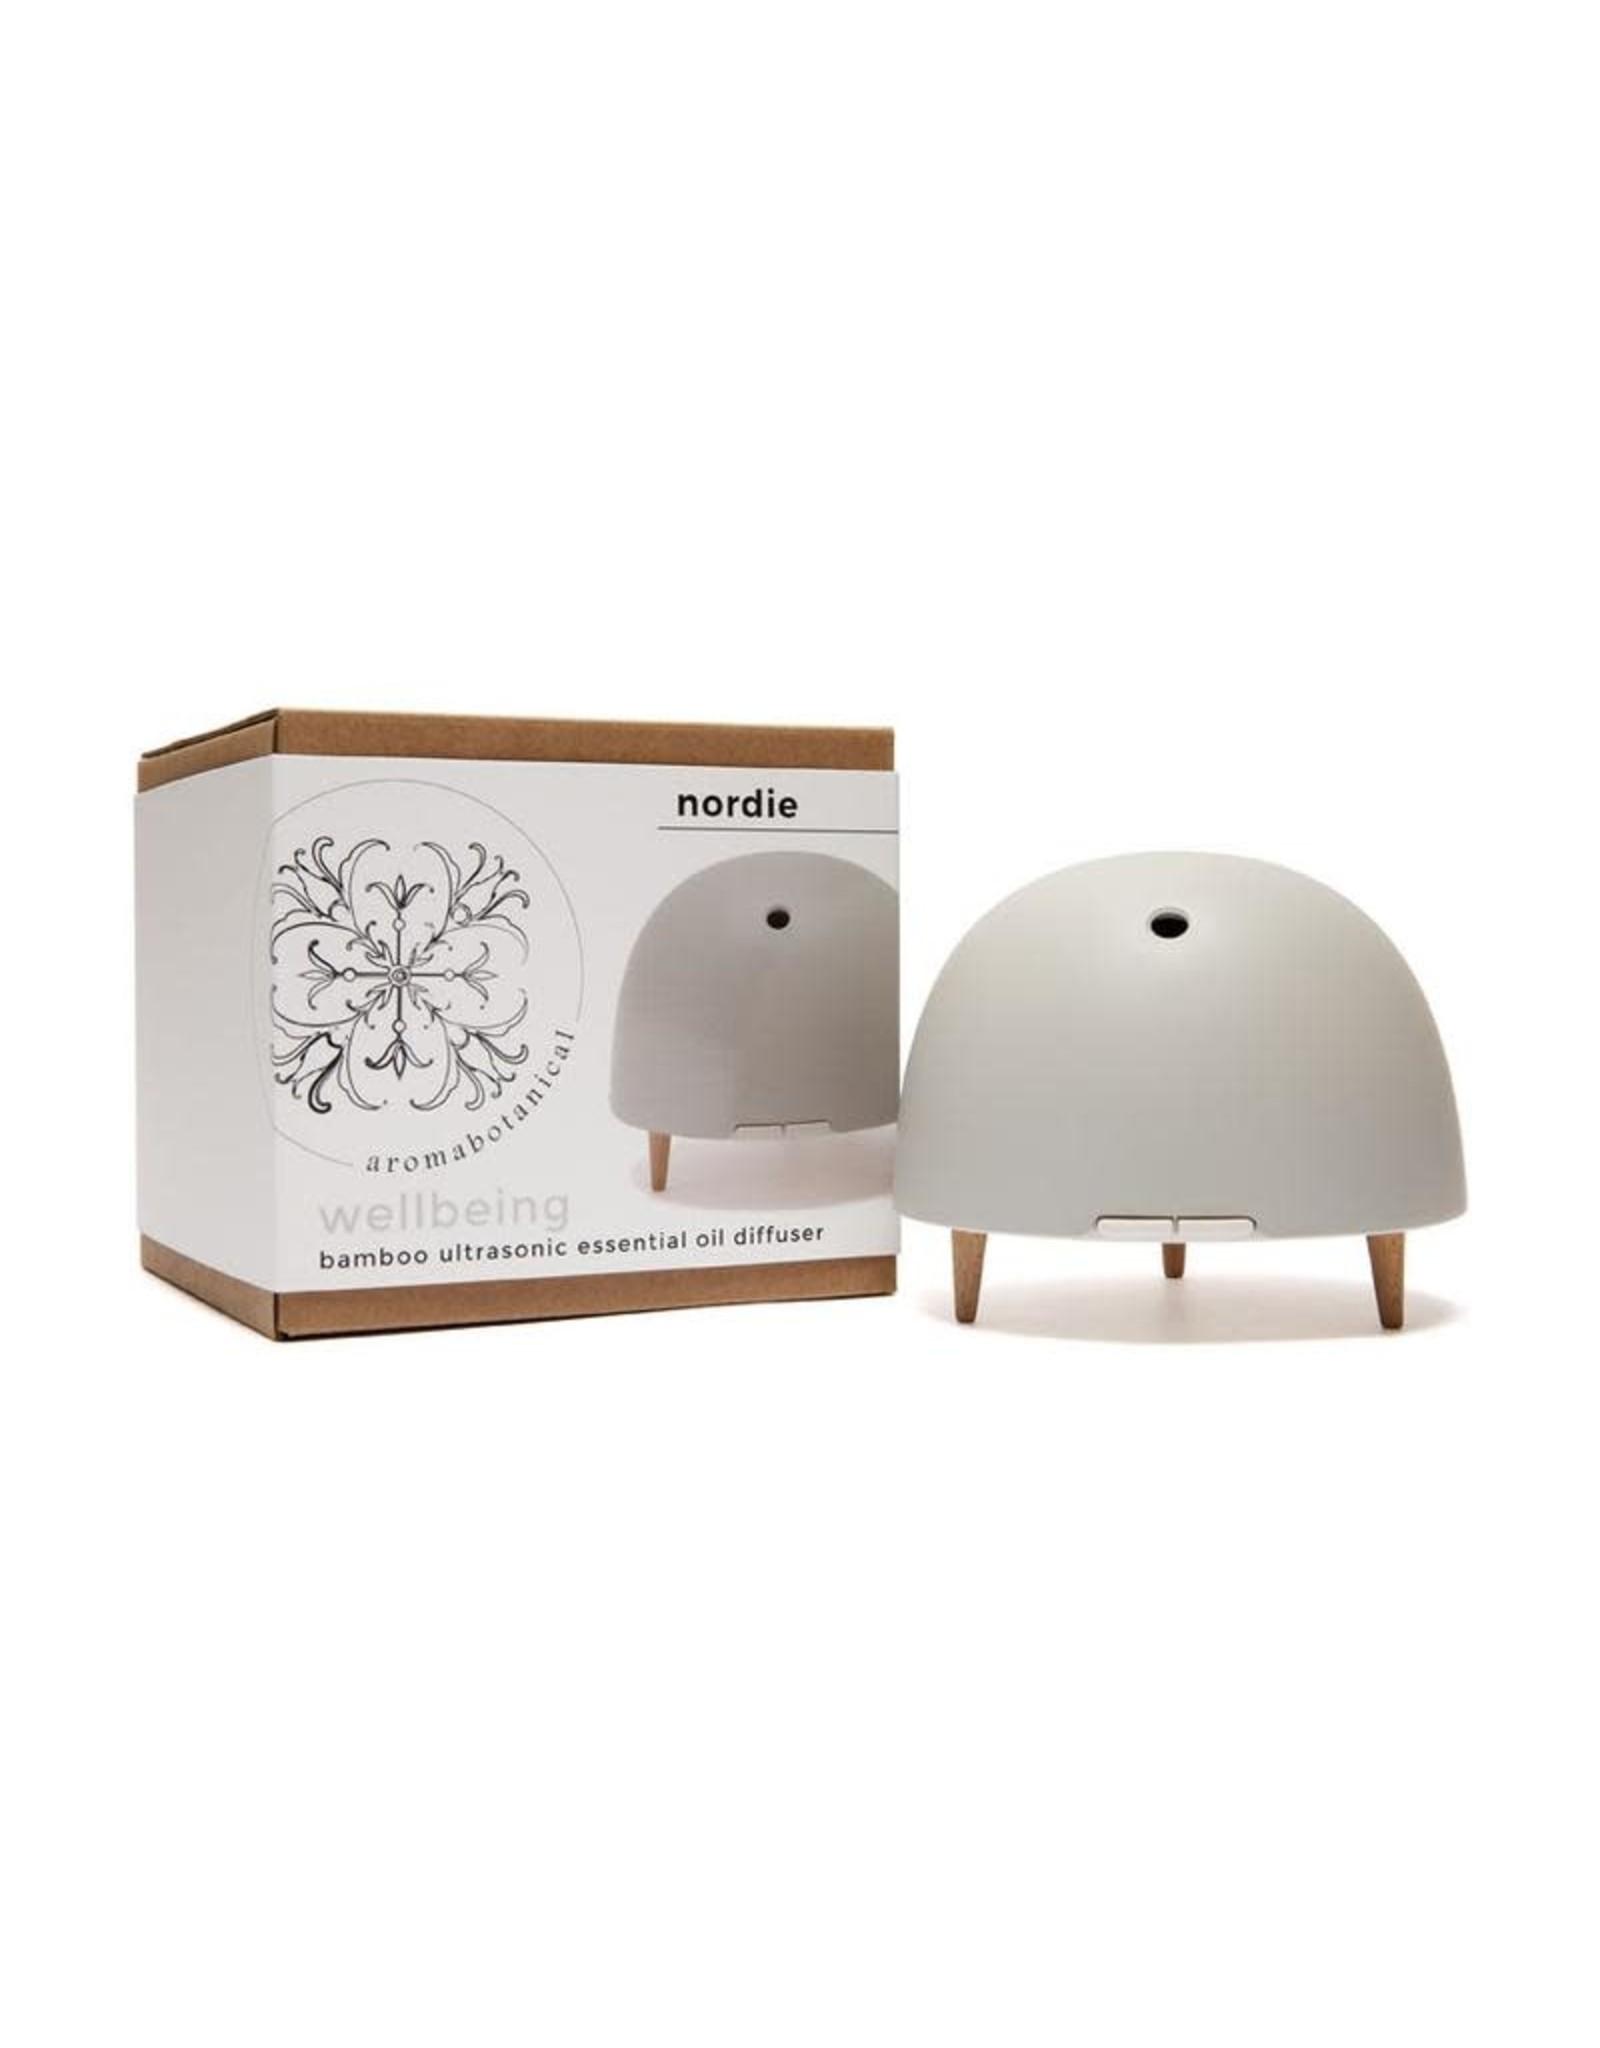 AromaBotanicals Nordie Ultrasonic Diffuser - Natural